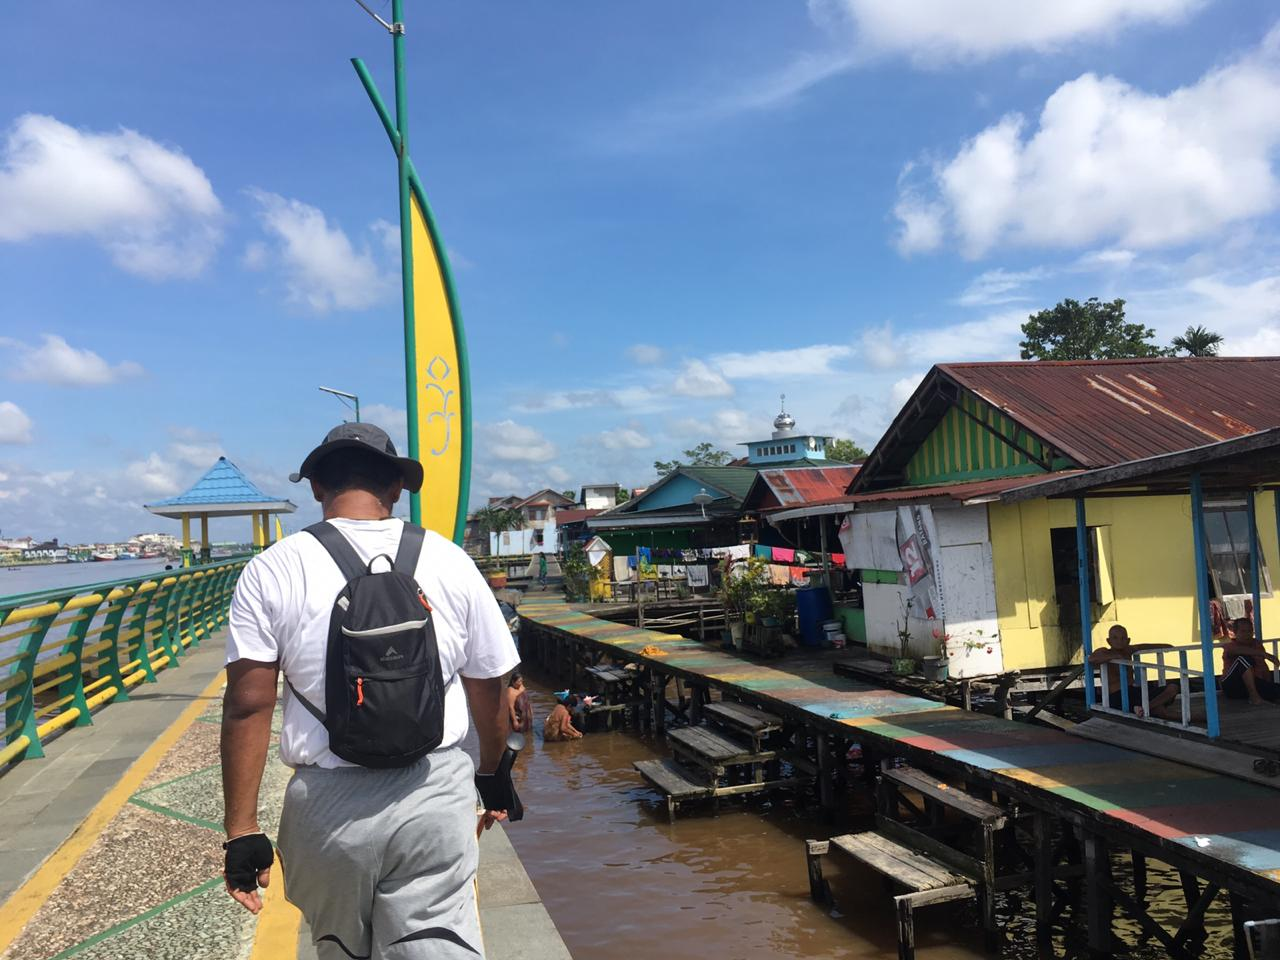 Paket Wisata Jalan Kaki Pontianak Rute Perkampungan Sungai Kapuas